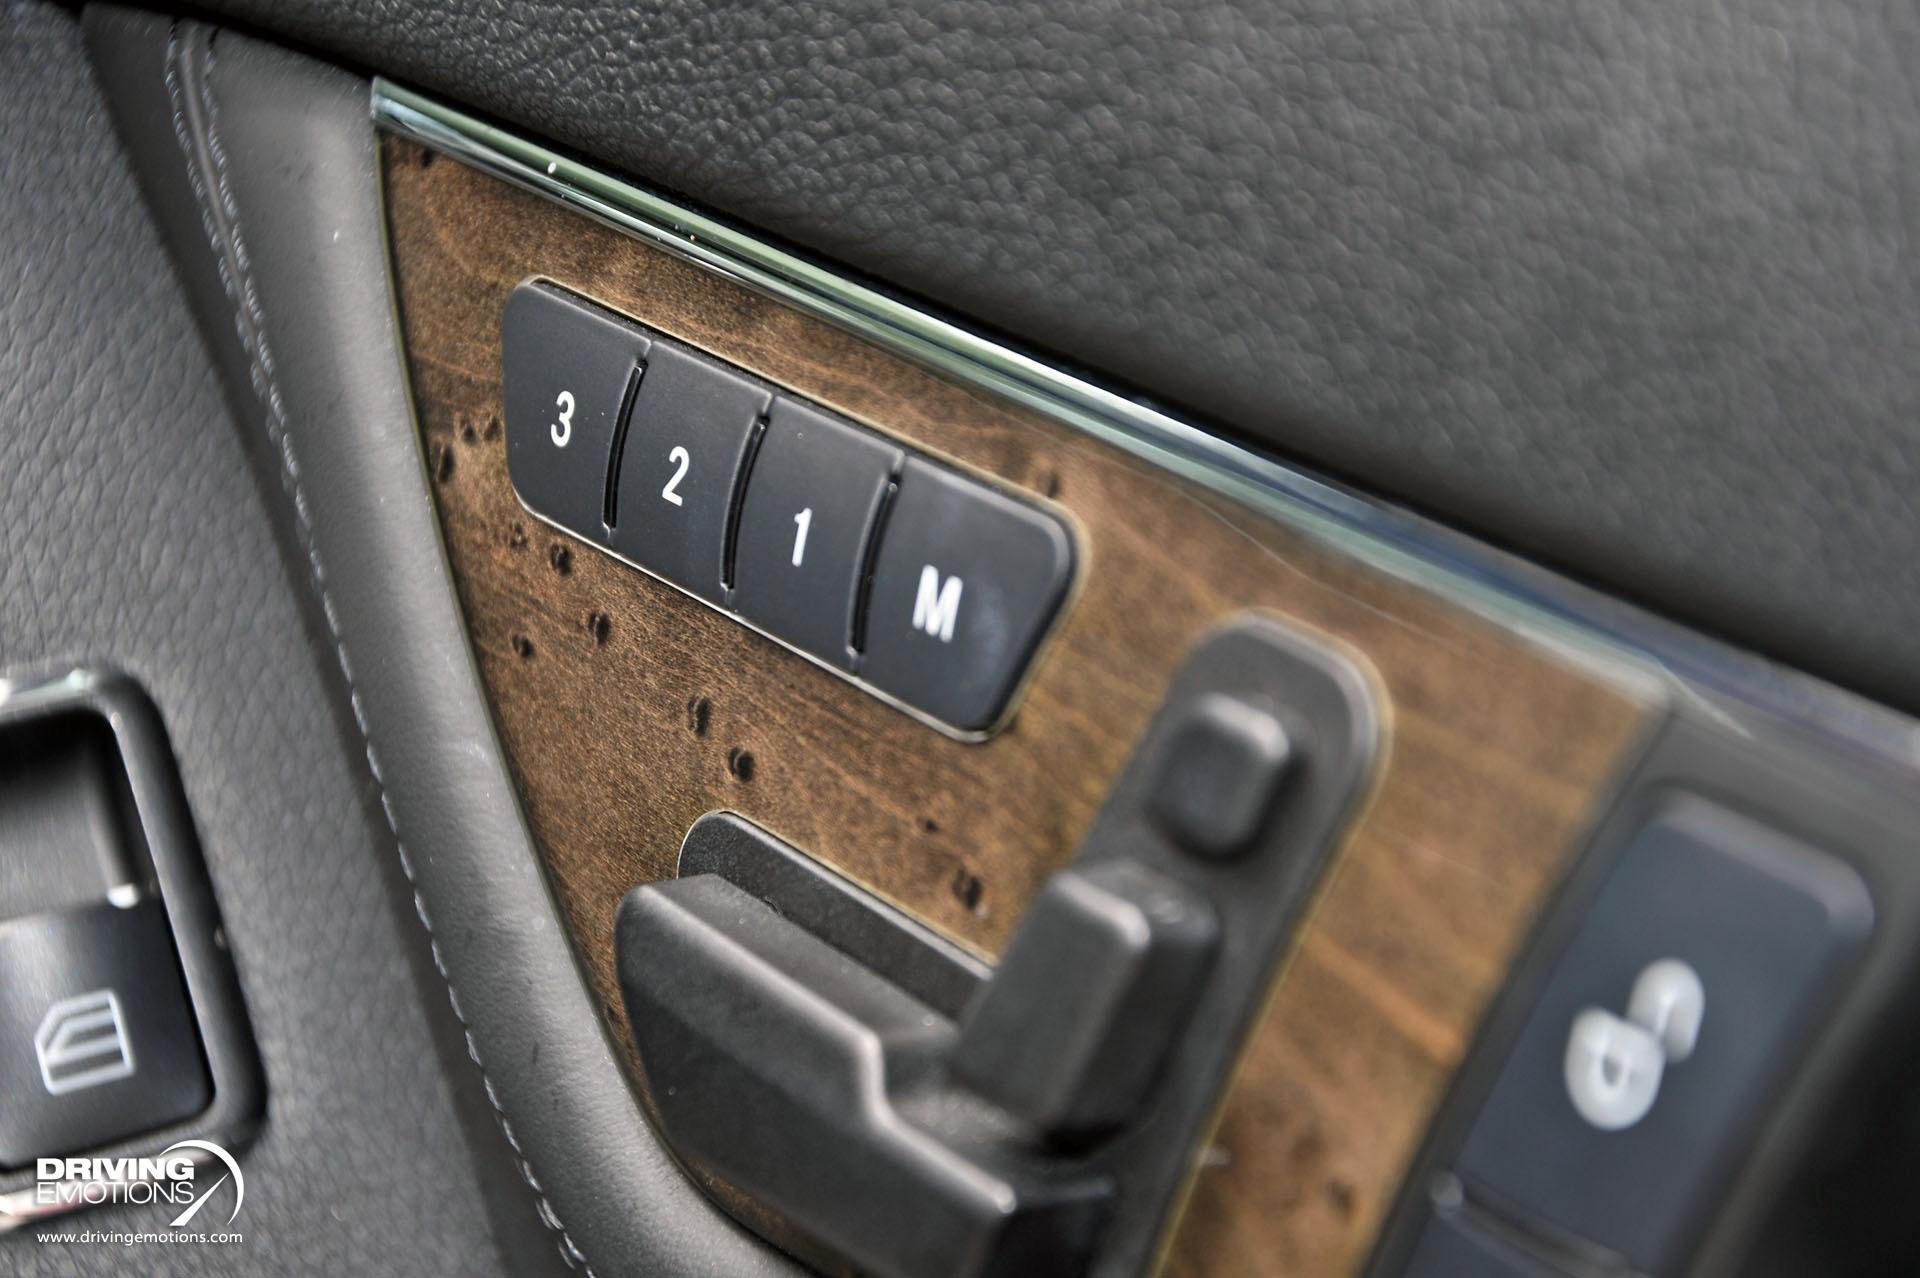 Used 2008 Mercedes-Benz C63 AMG Sedan C 63 AMG V8 | Lake Park, FL